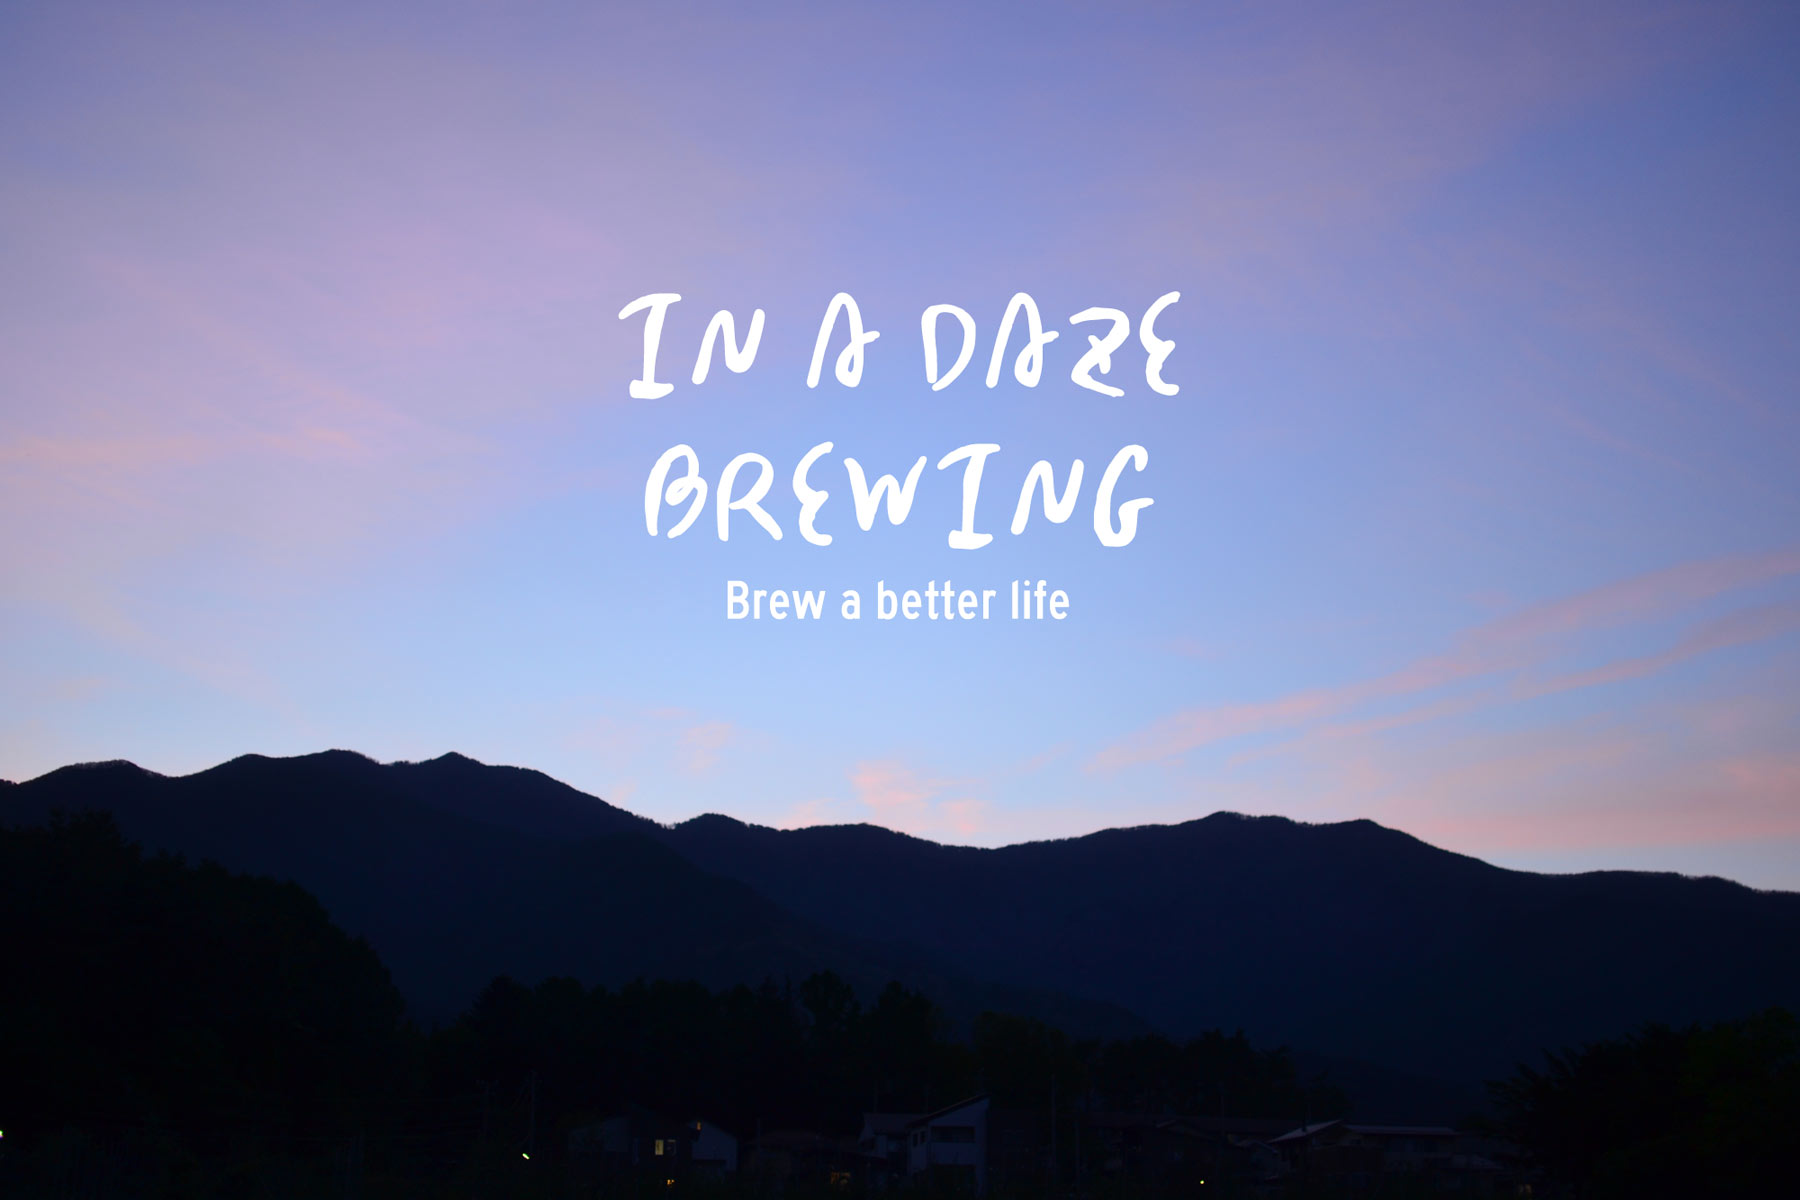 In a daze brewing, brew a better life